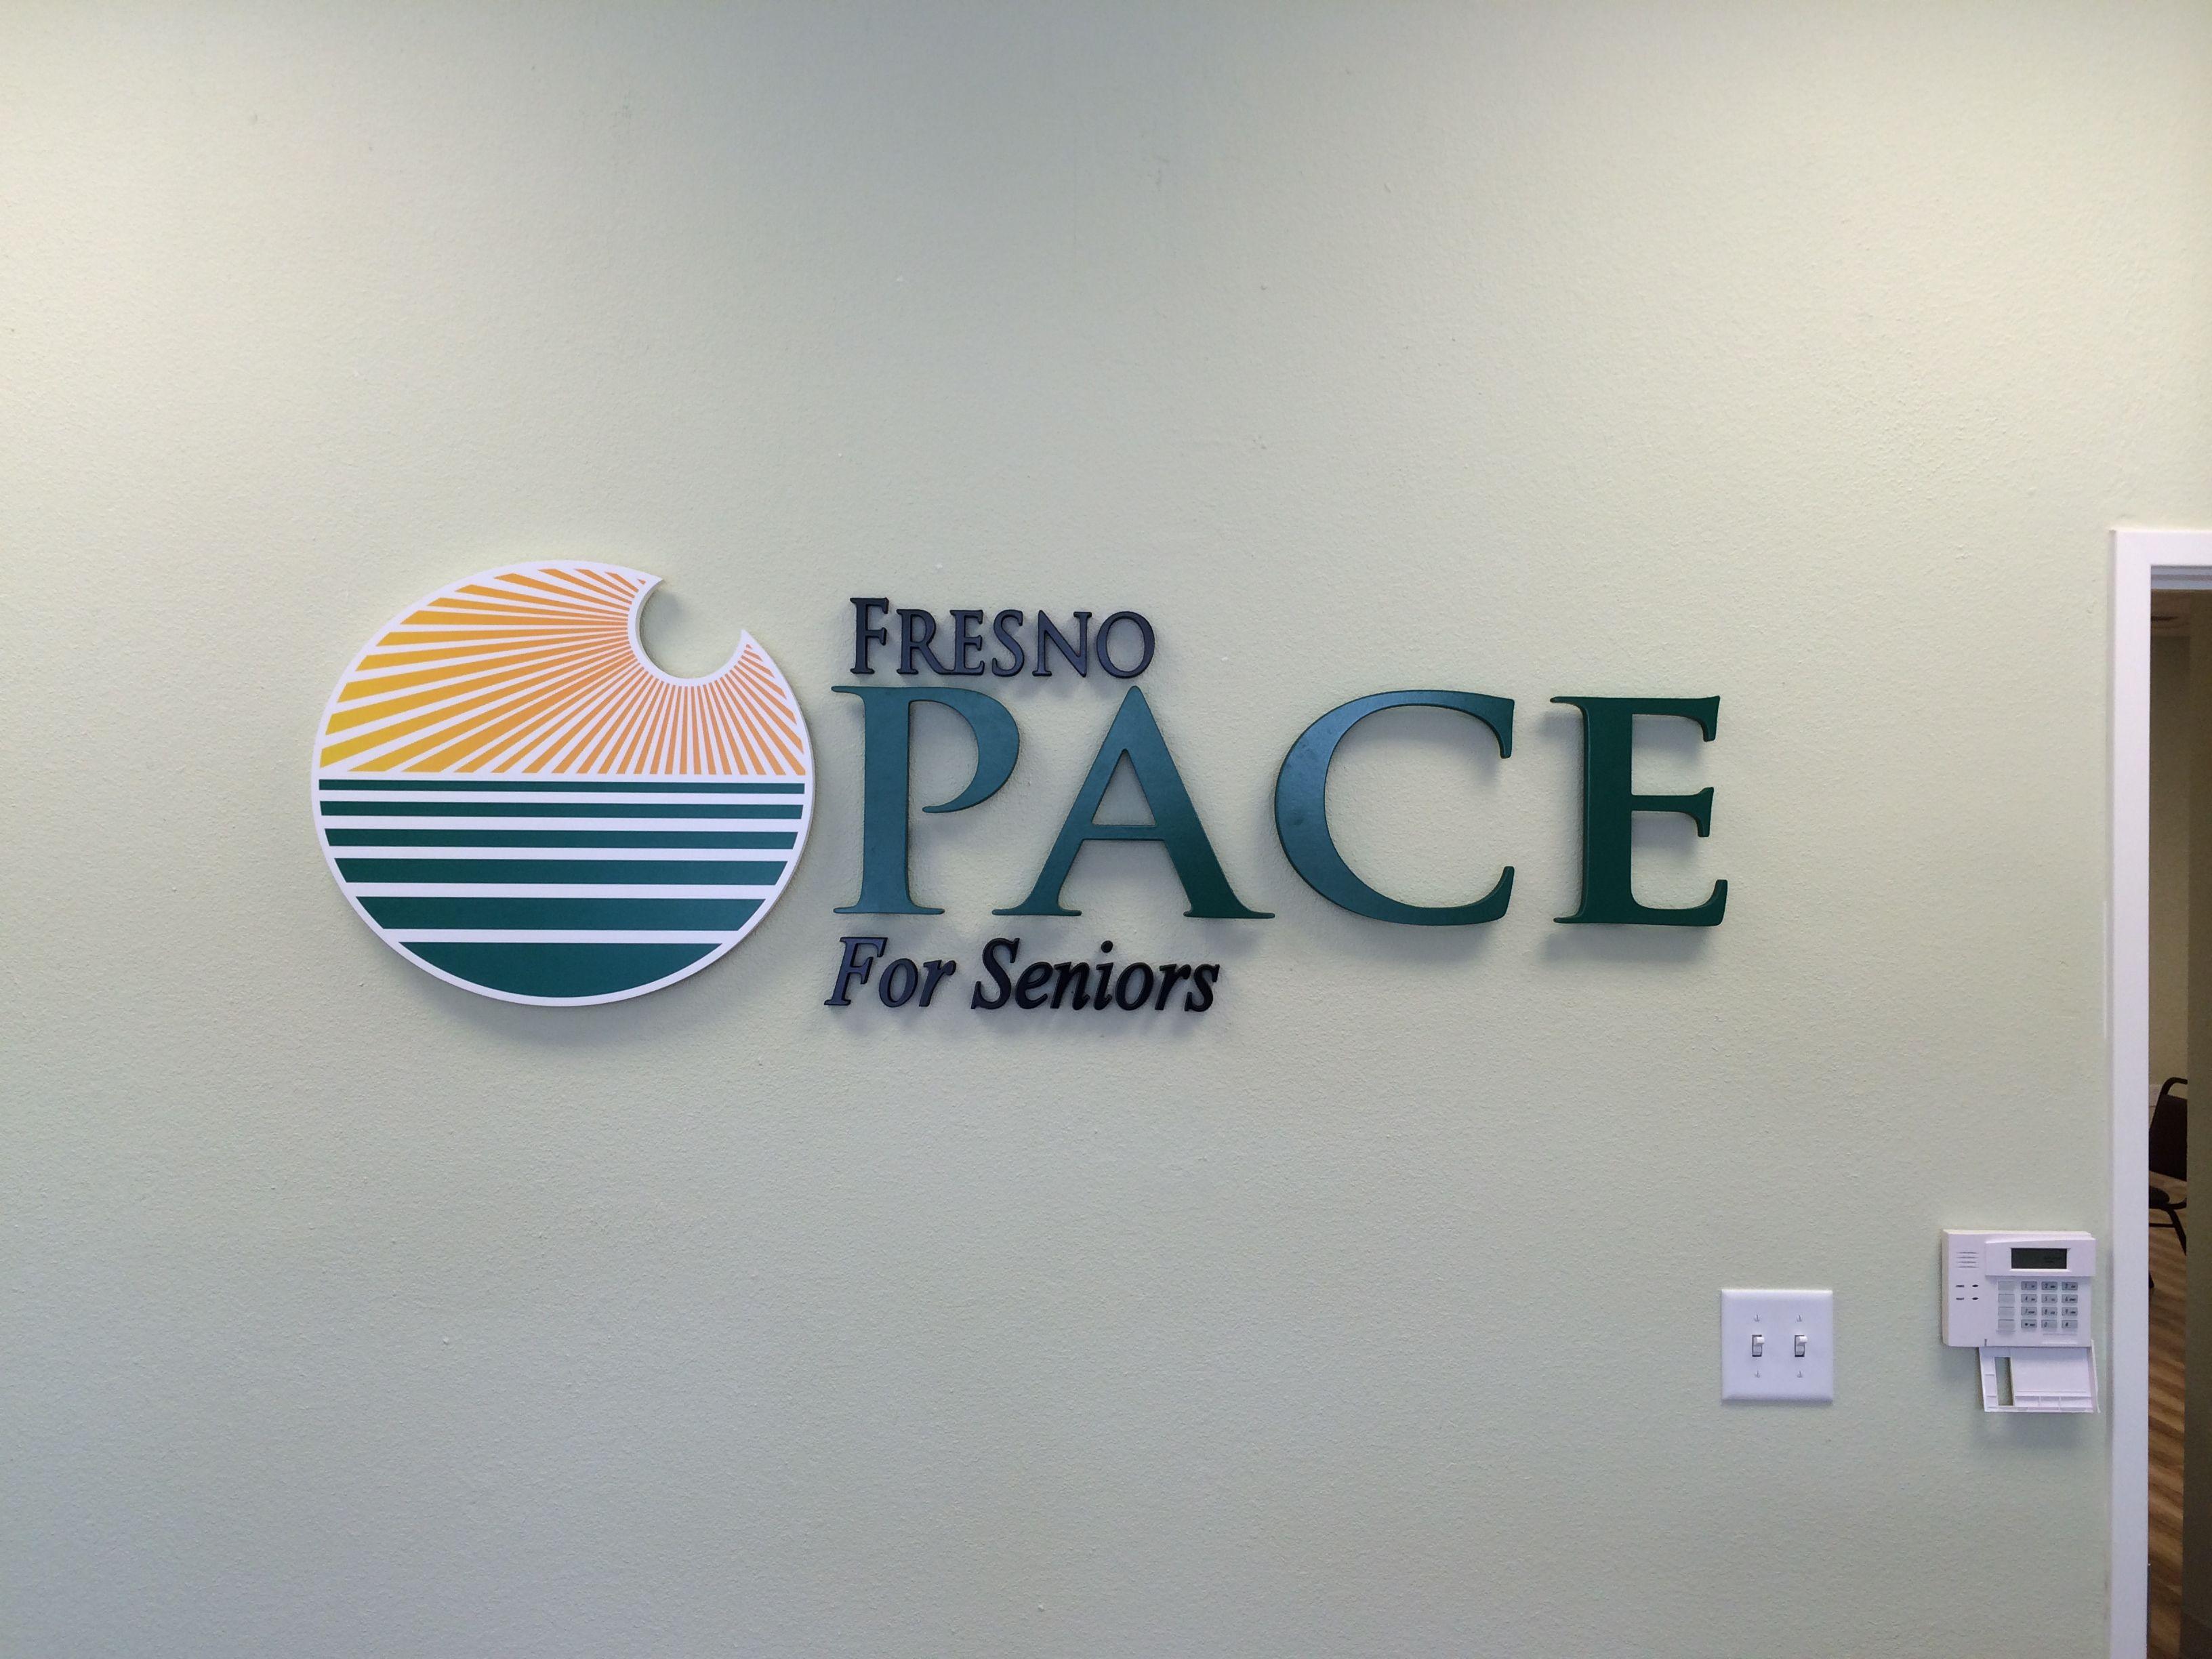 Fresno Pace